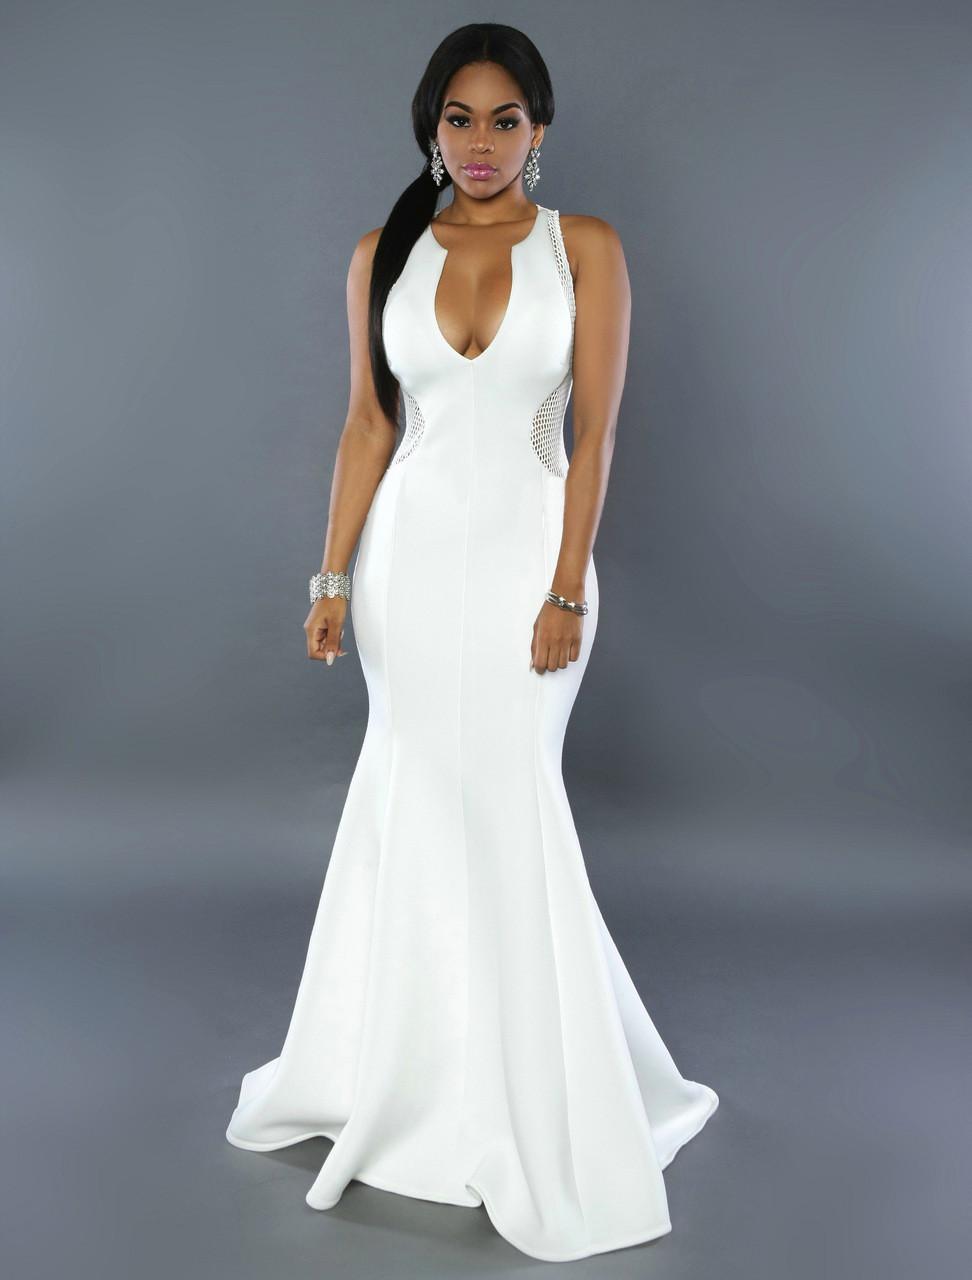 New-Arrival-Fashion-Dress-20439-1-20439-1-1